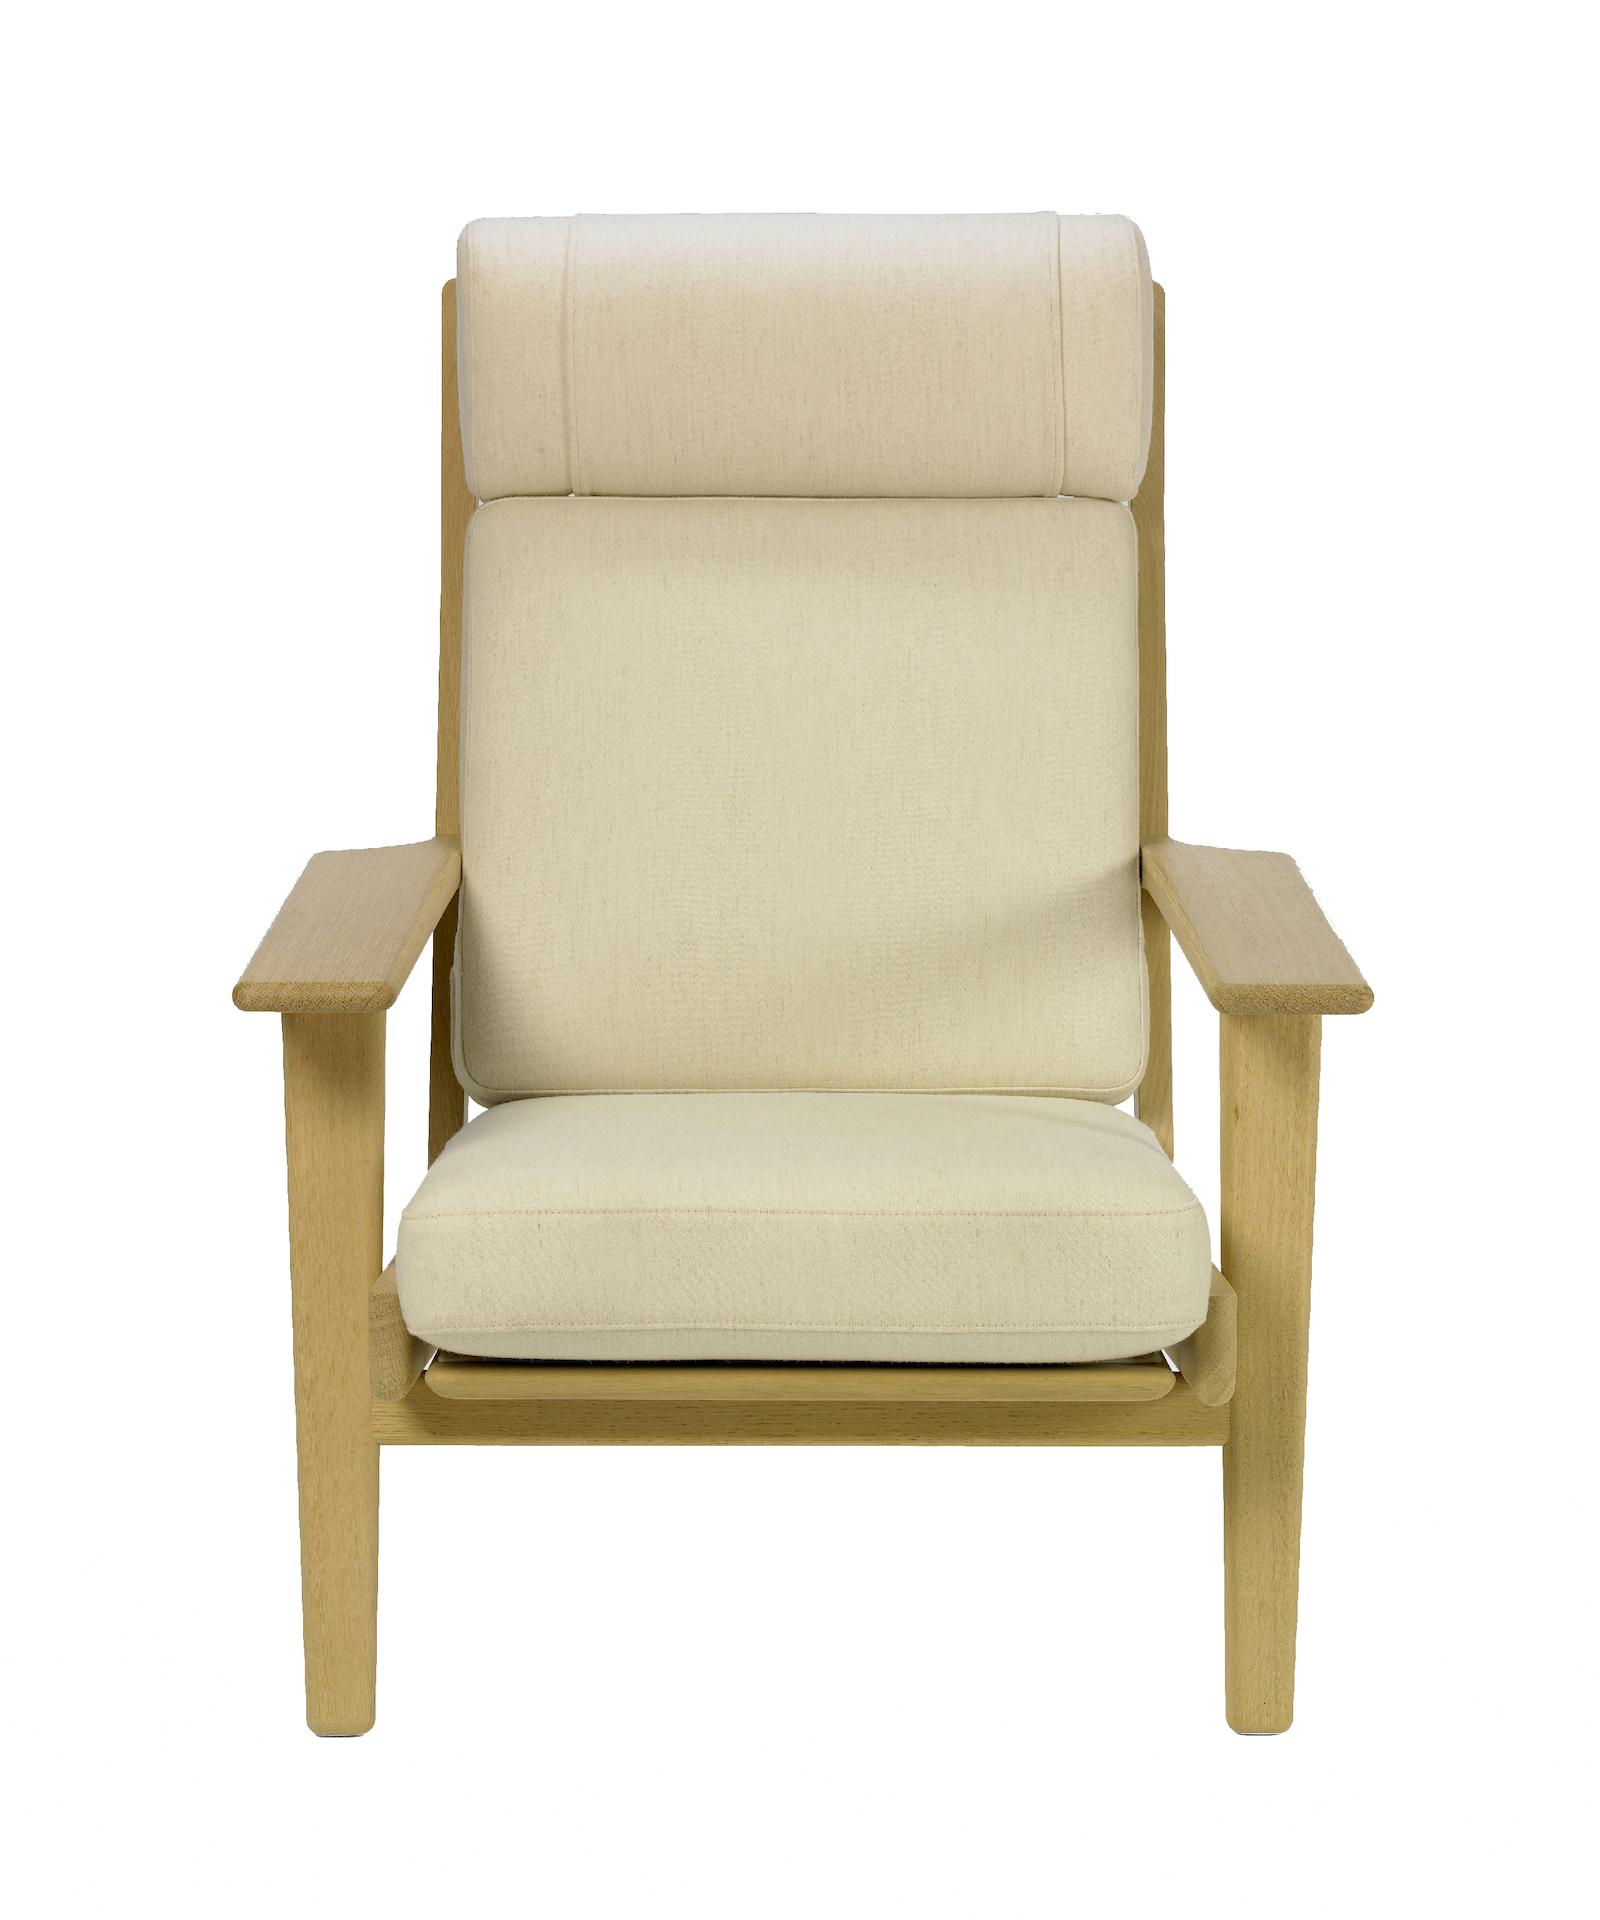 GE_290A_Lounge_Chair_Getama_Hans_Wegner_Gestalt_NewYork_3.JPG